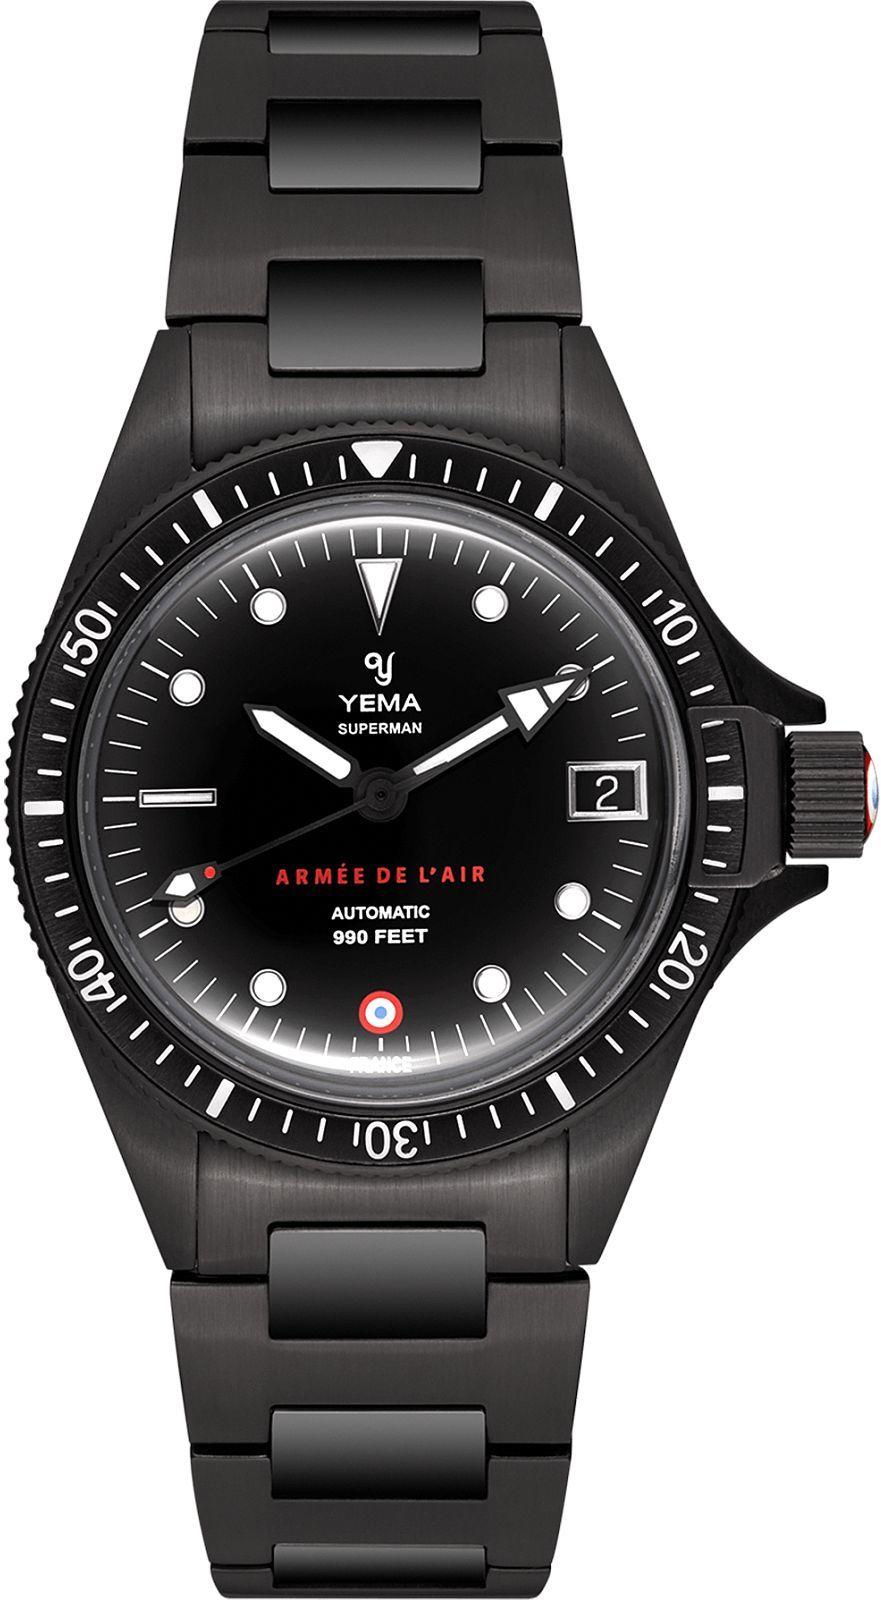 Zegarek męski Yema Superman French Air Force Black Limited Edition